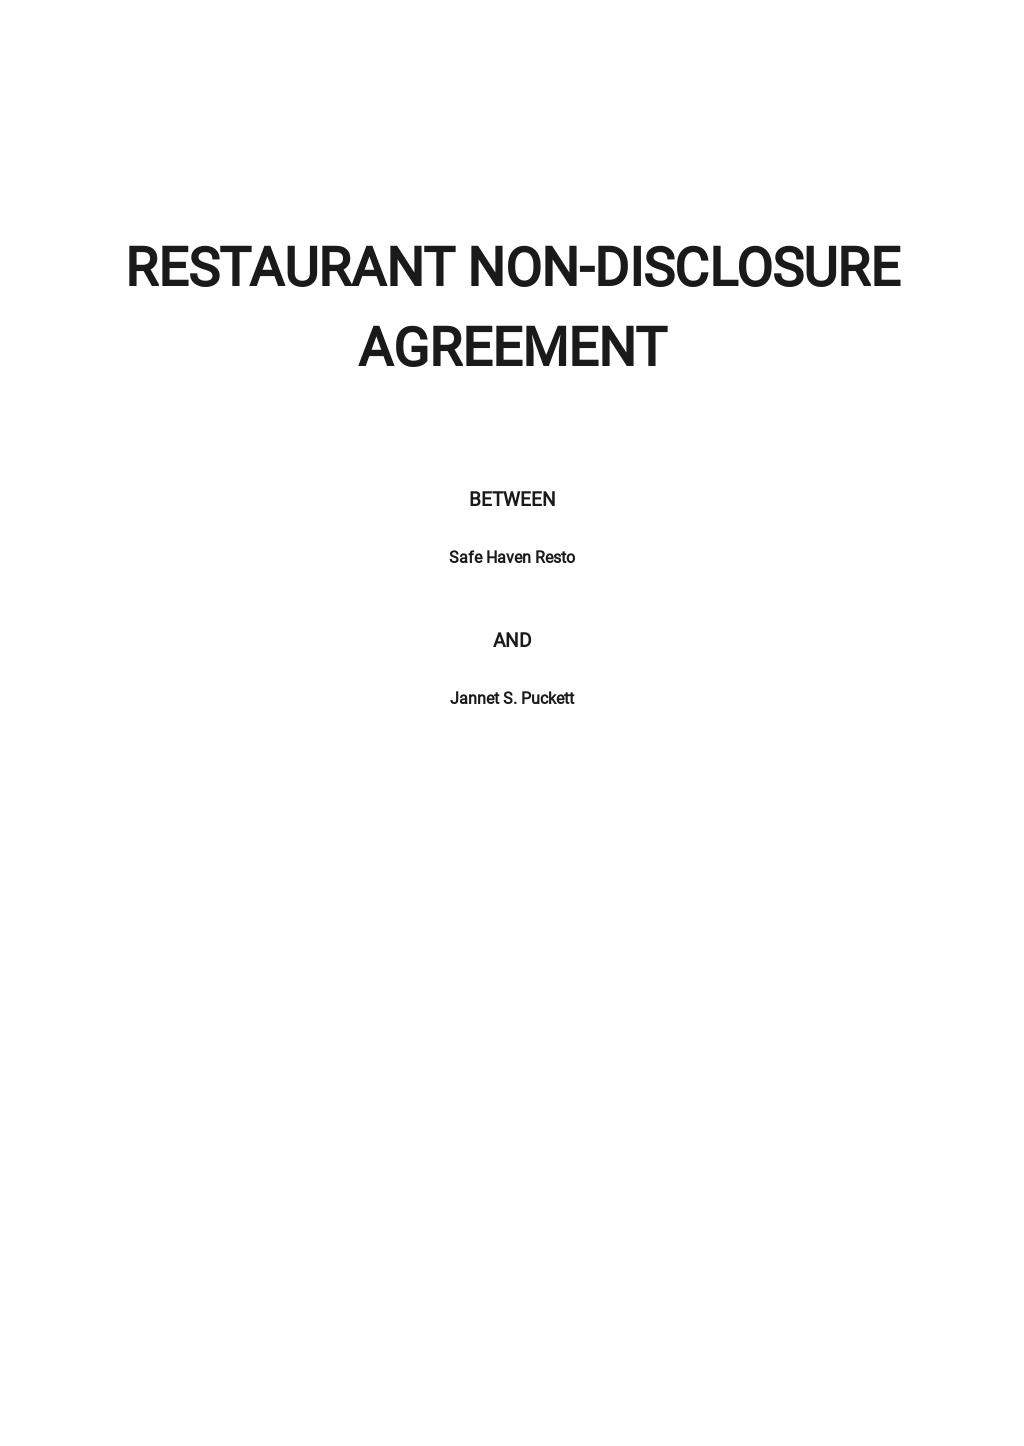 Restaurant Non Disclosure Agreement Template.jpe